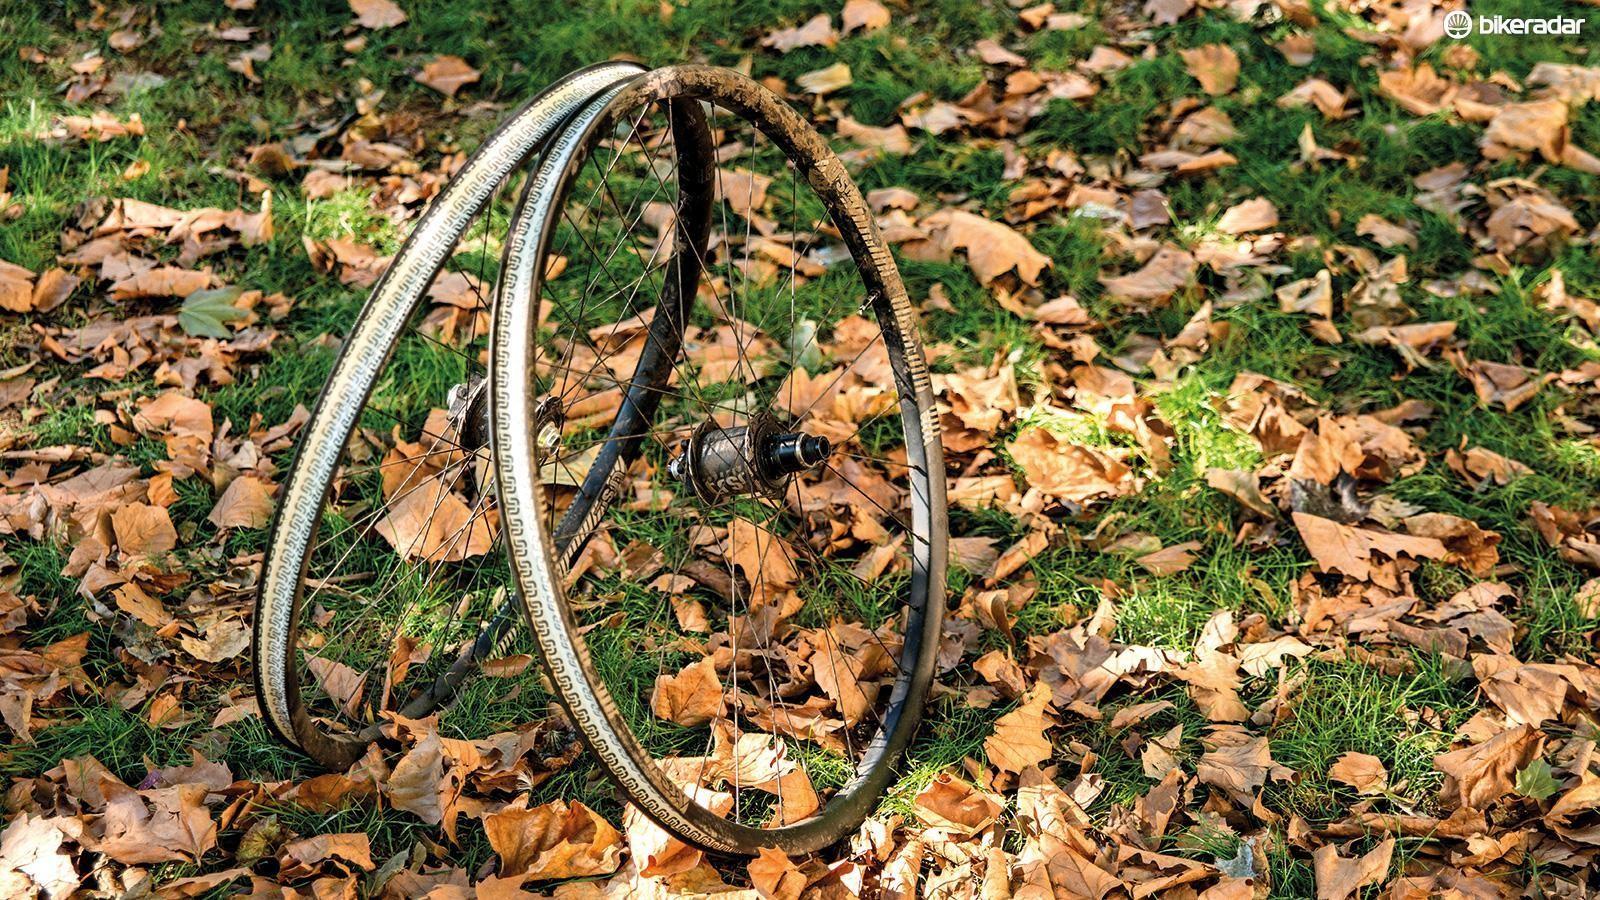 The e*thirteen TRS Race Carbon wheelset